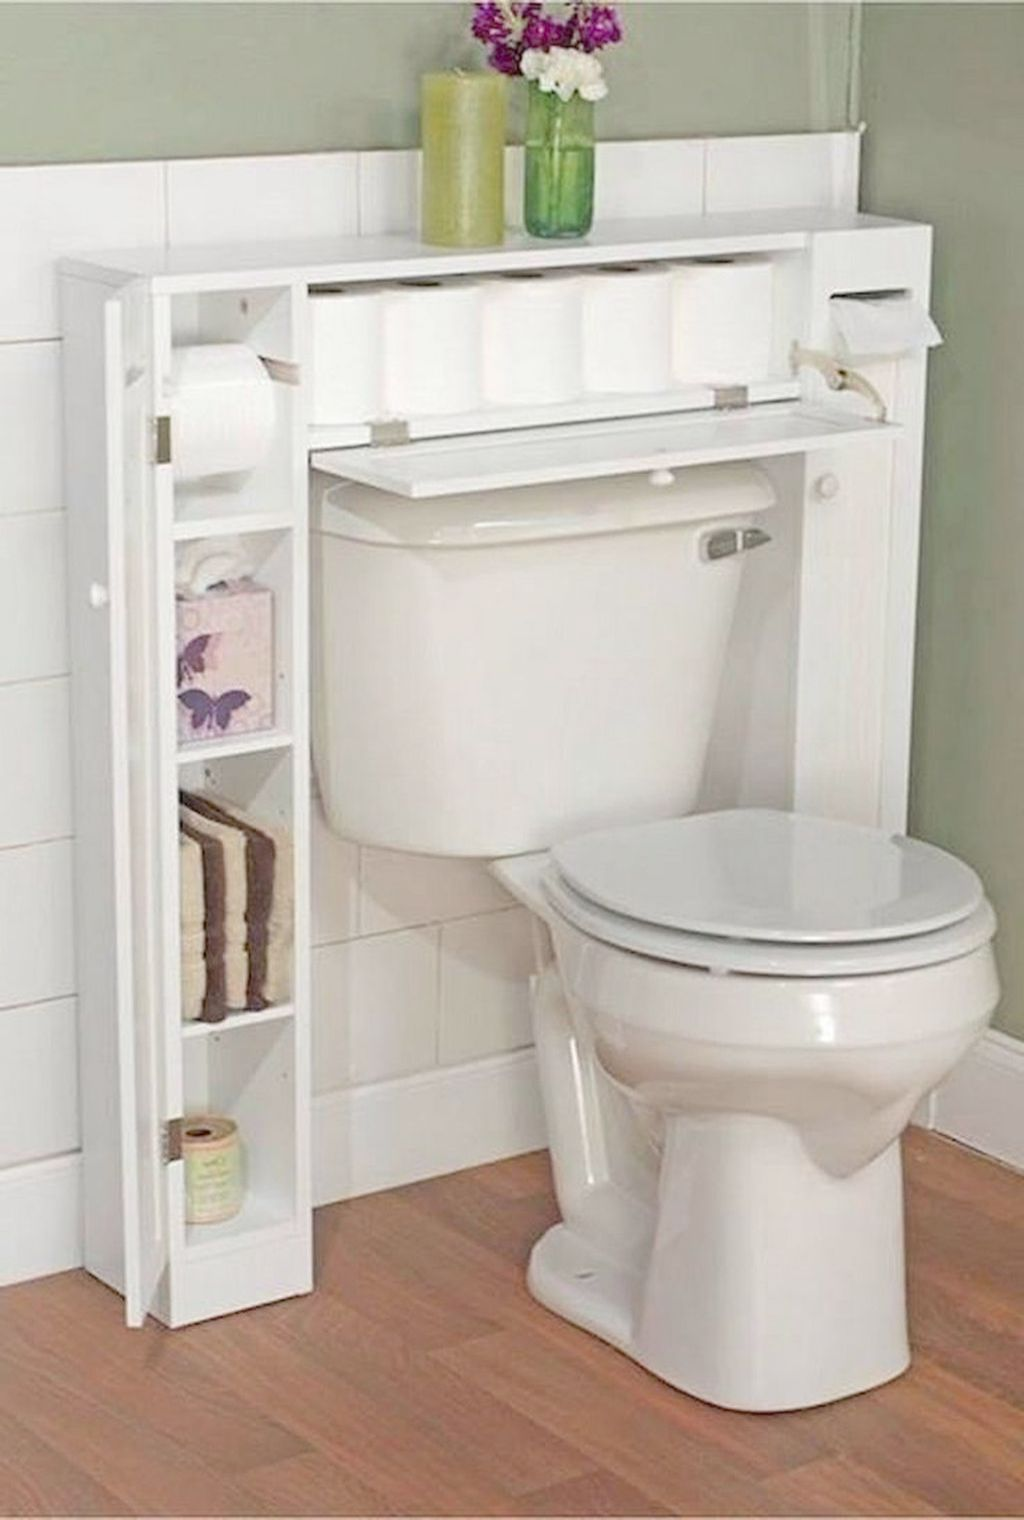 Gramercy Bathroom Toilet Paper Holder Storage Organizer Avec